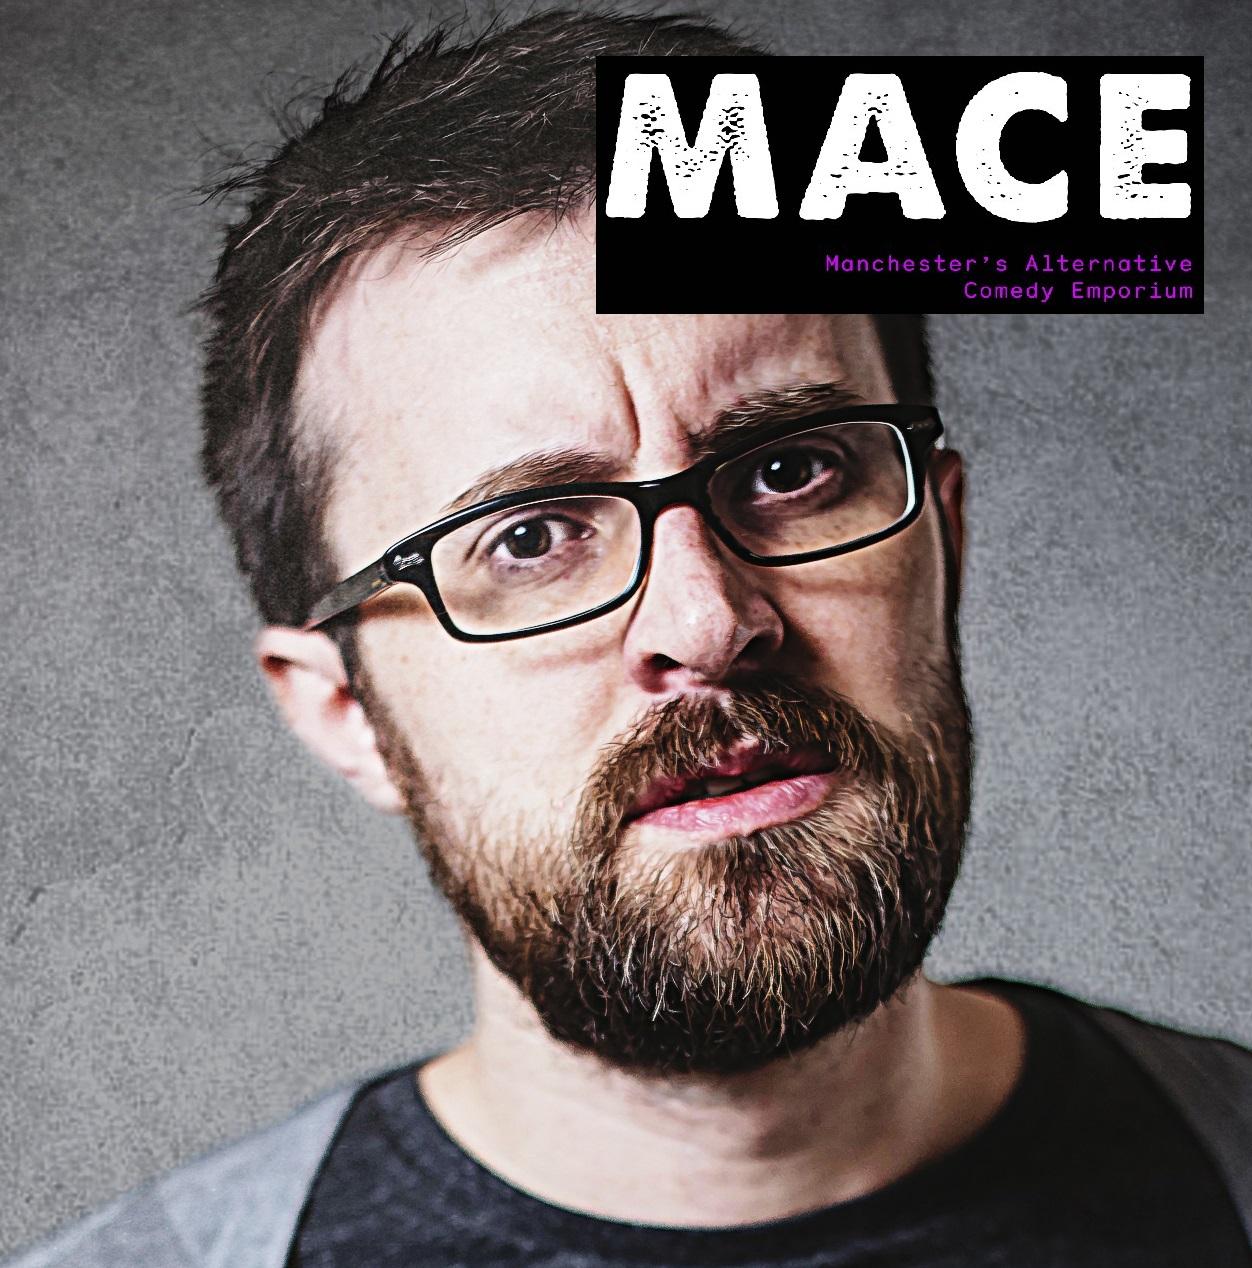 dolan_mace